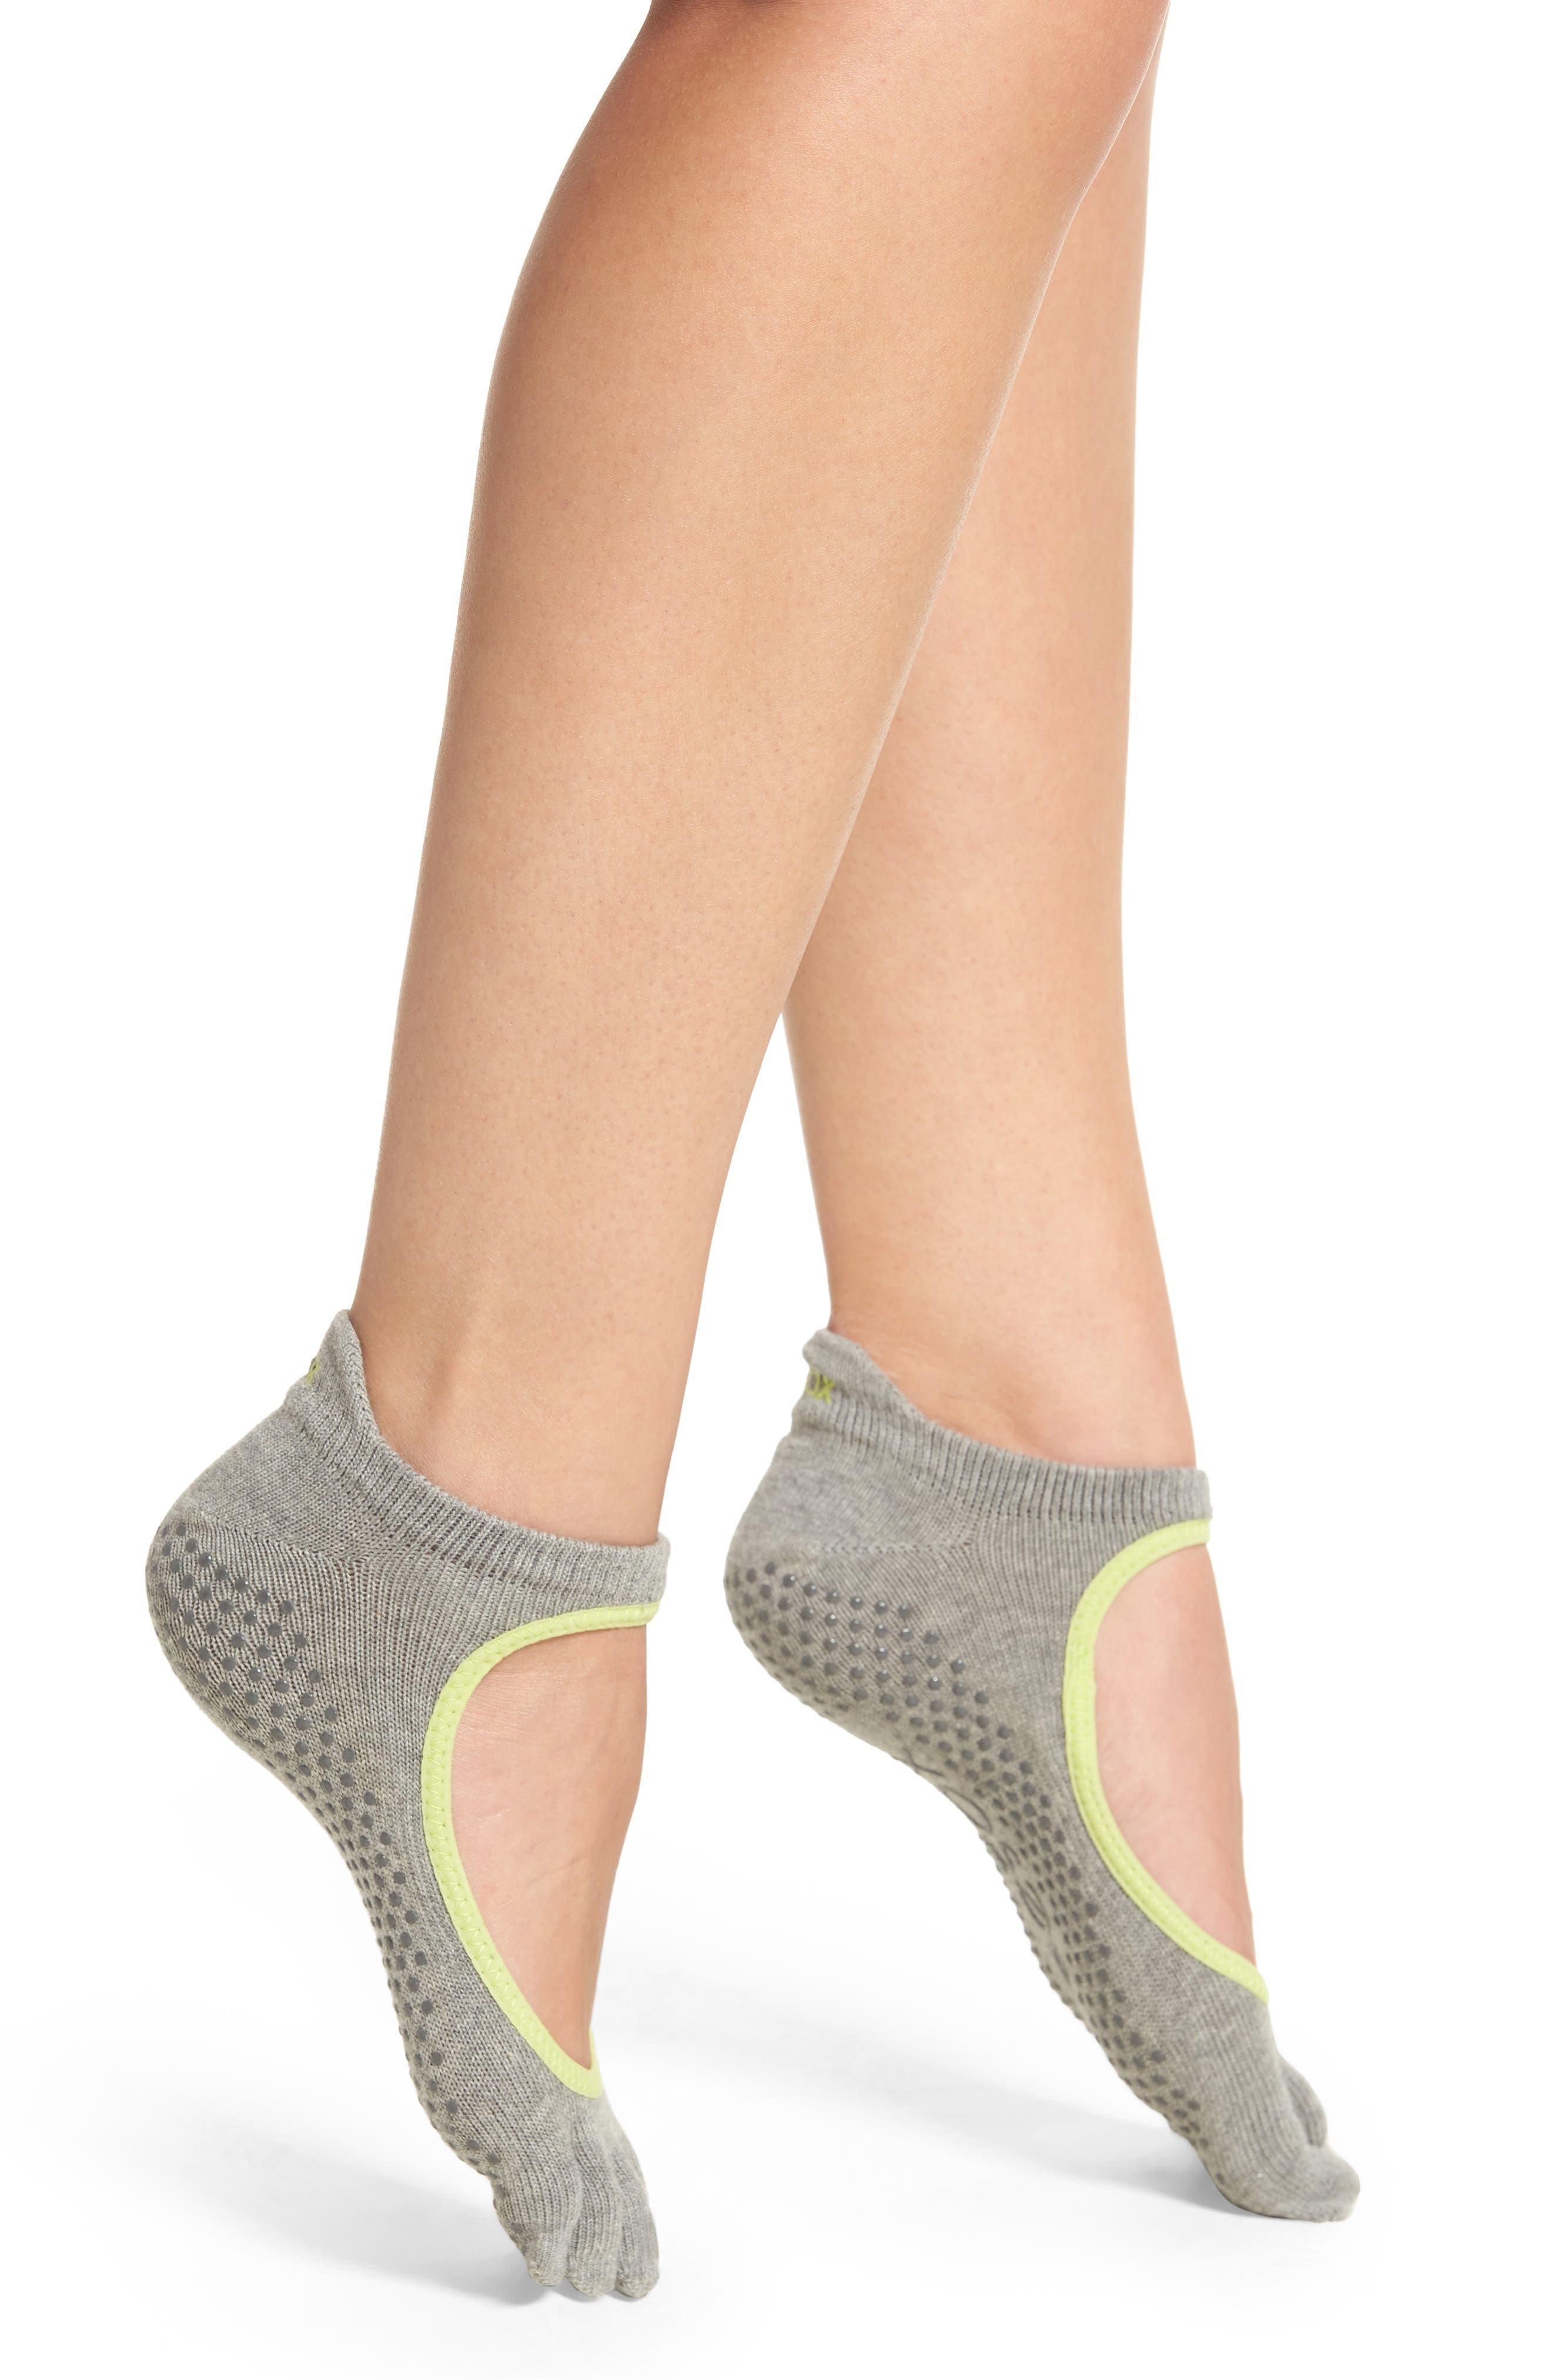 Bellarina Full Toe Gripper Socks,                             Main thumbnail 1, color,                             HEATHER GREY/ LIME